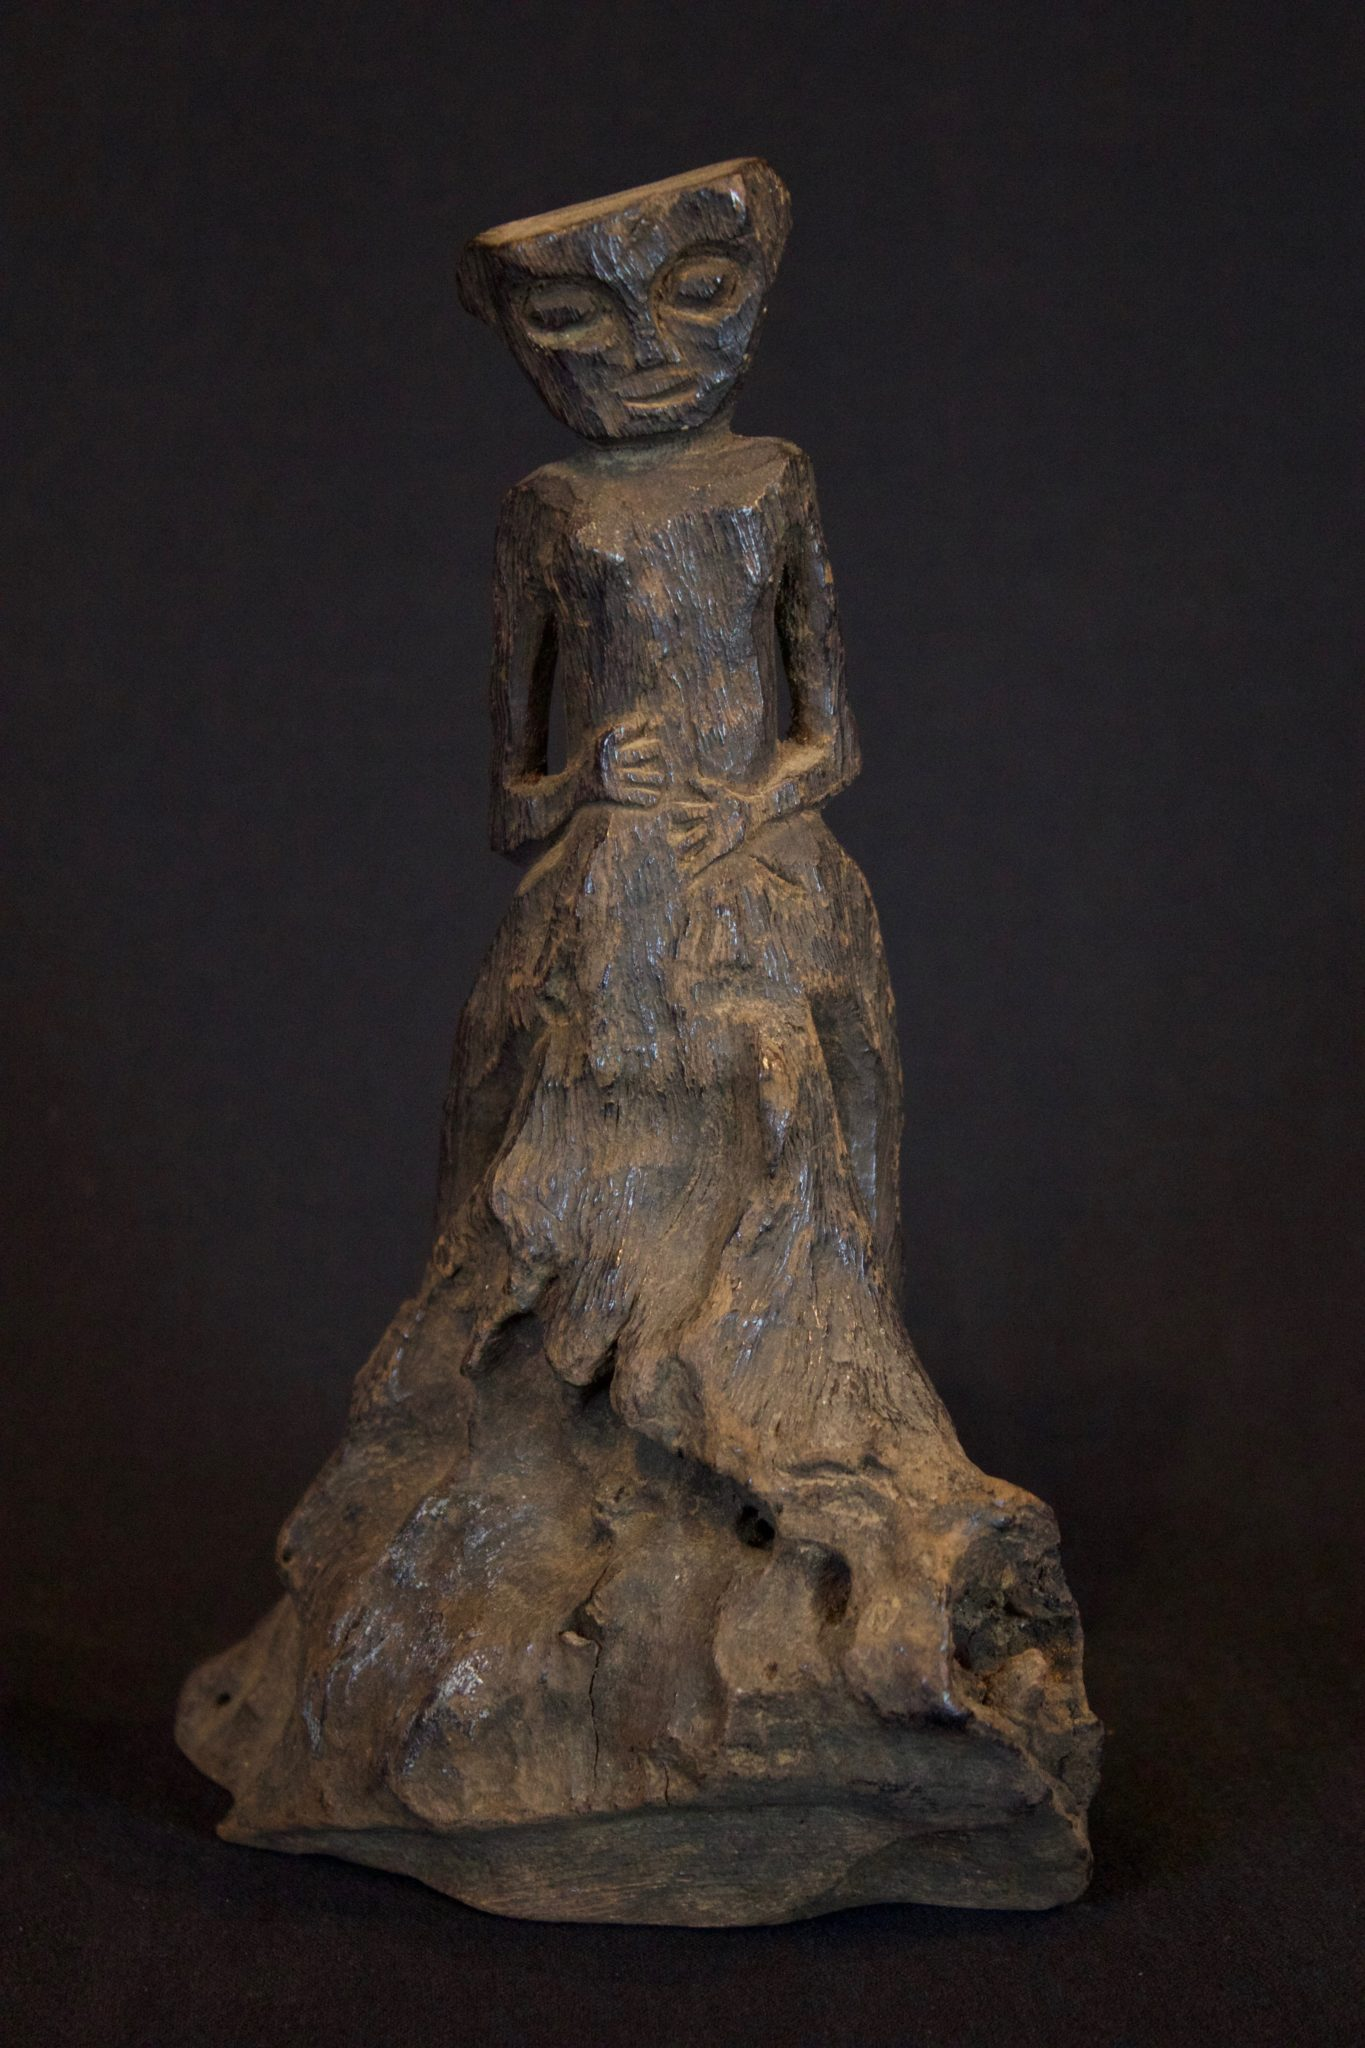 "Shaman Female Amulet Figure, Kalimantan, Borneo, Indonesia, Dayak tribe, Early 20th c, Ironwood. Used for healing treatments, 8 ¼"" x 5"" x 4"", $90."